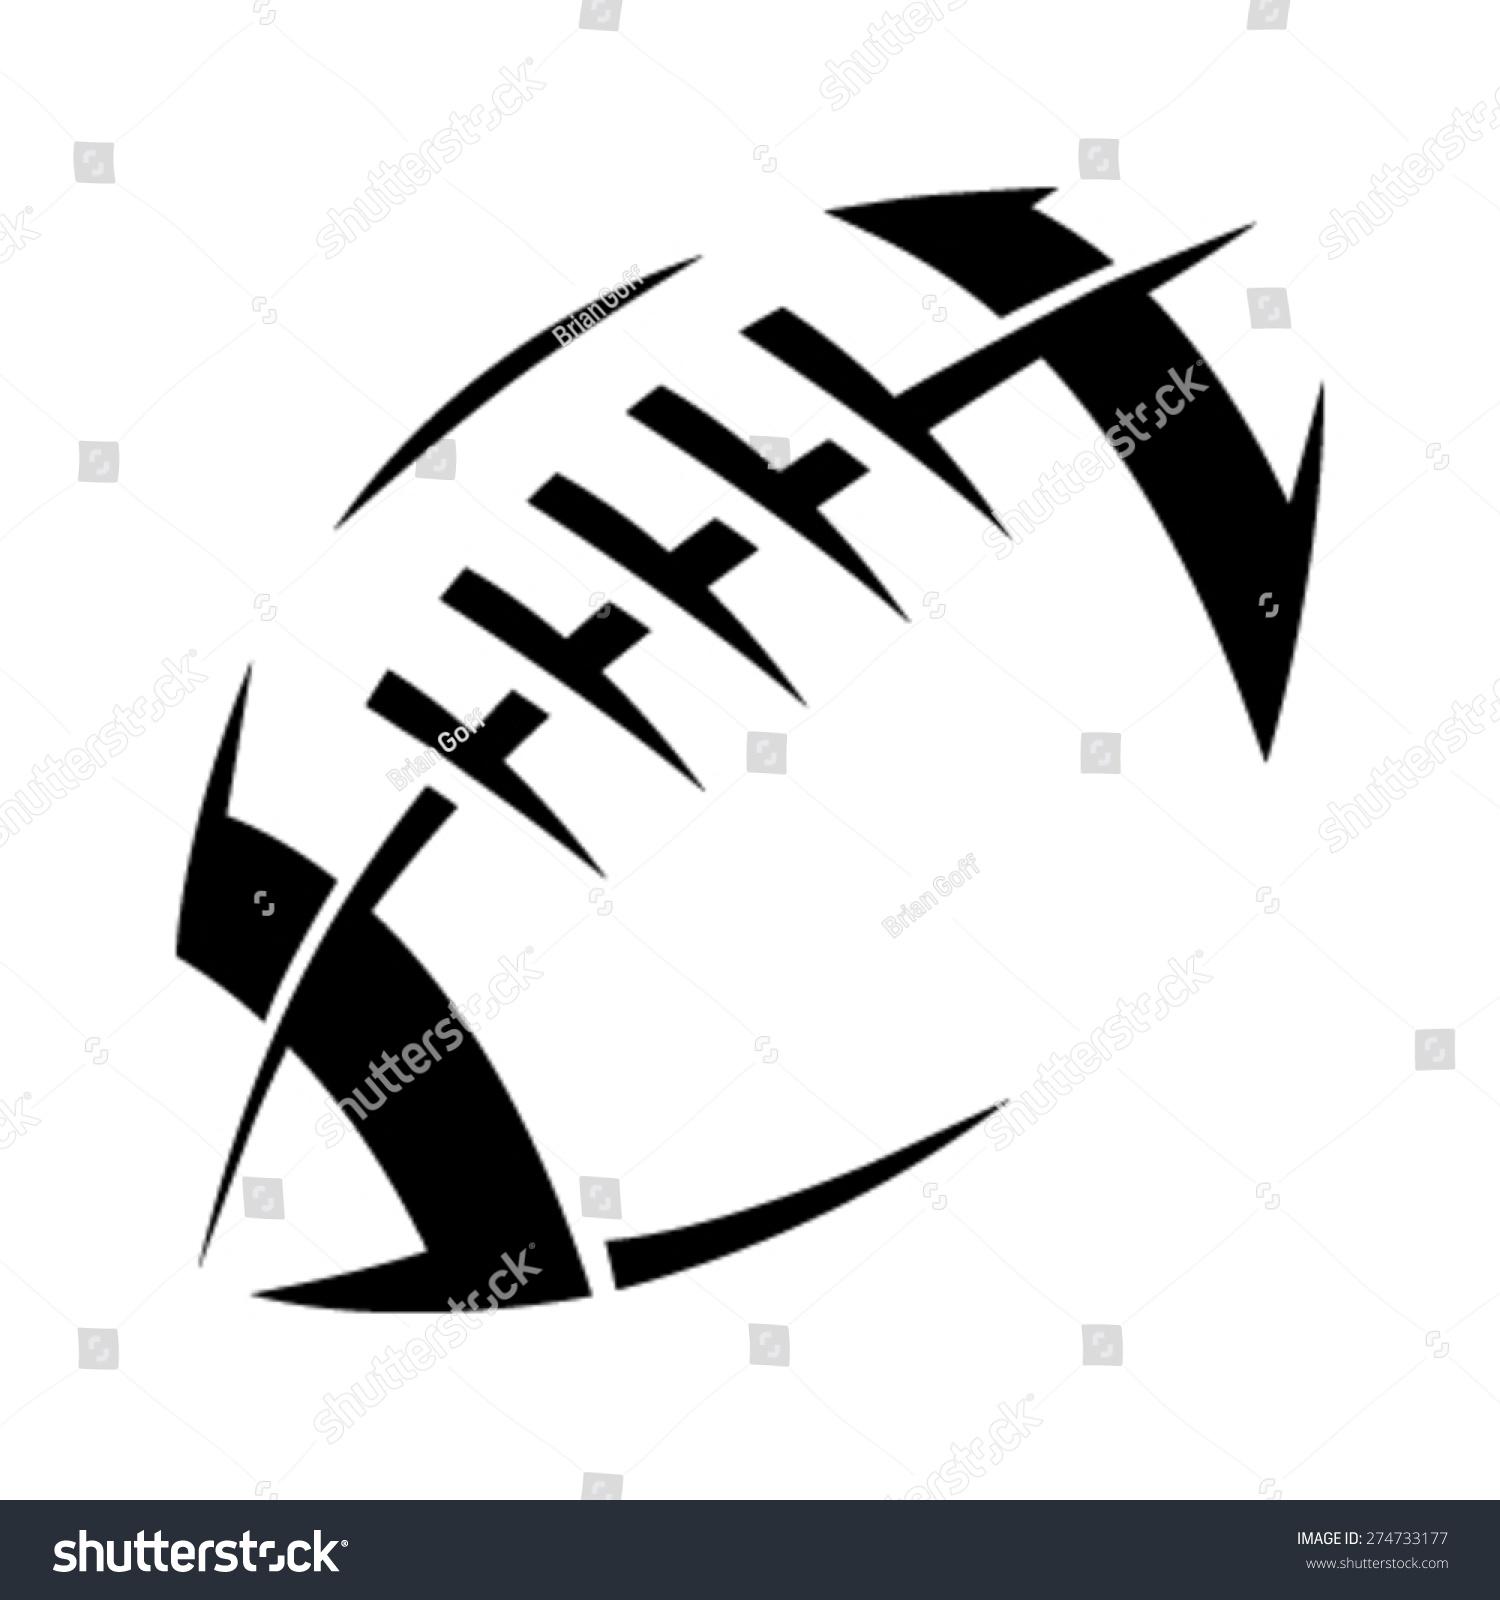 football clipart vector free - photo #48